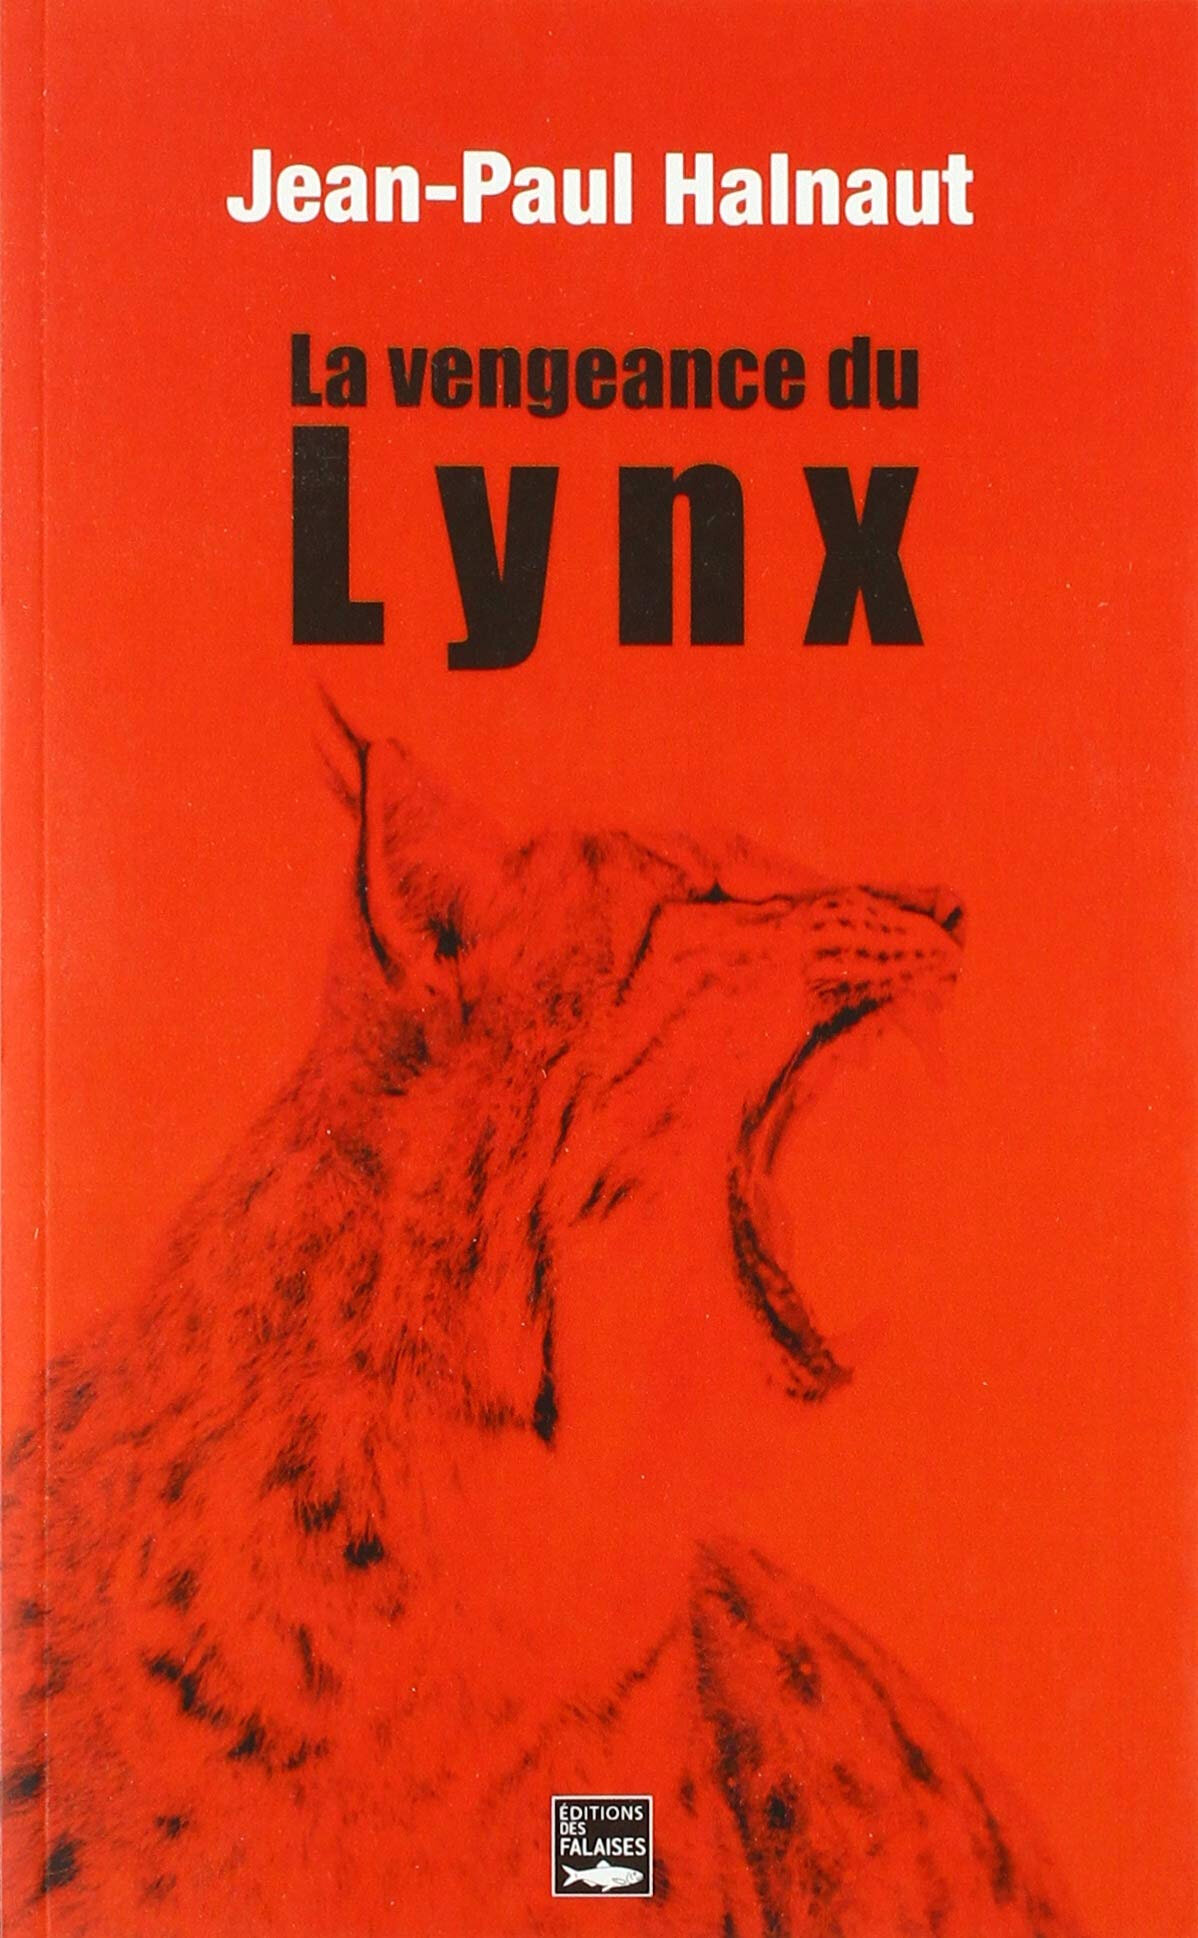 La vengeance du lynx de Jean-Paul Halnaut